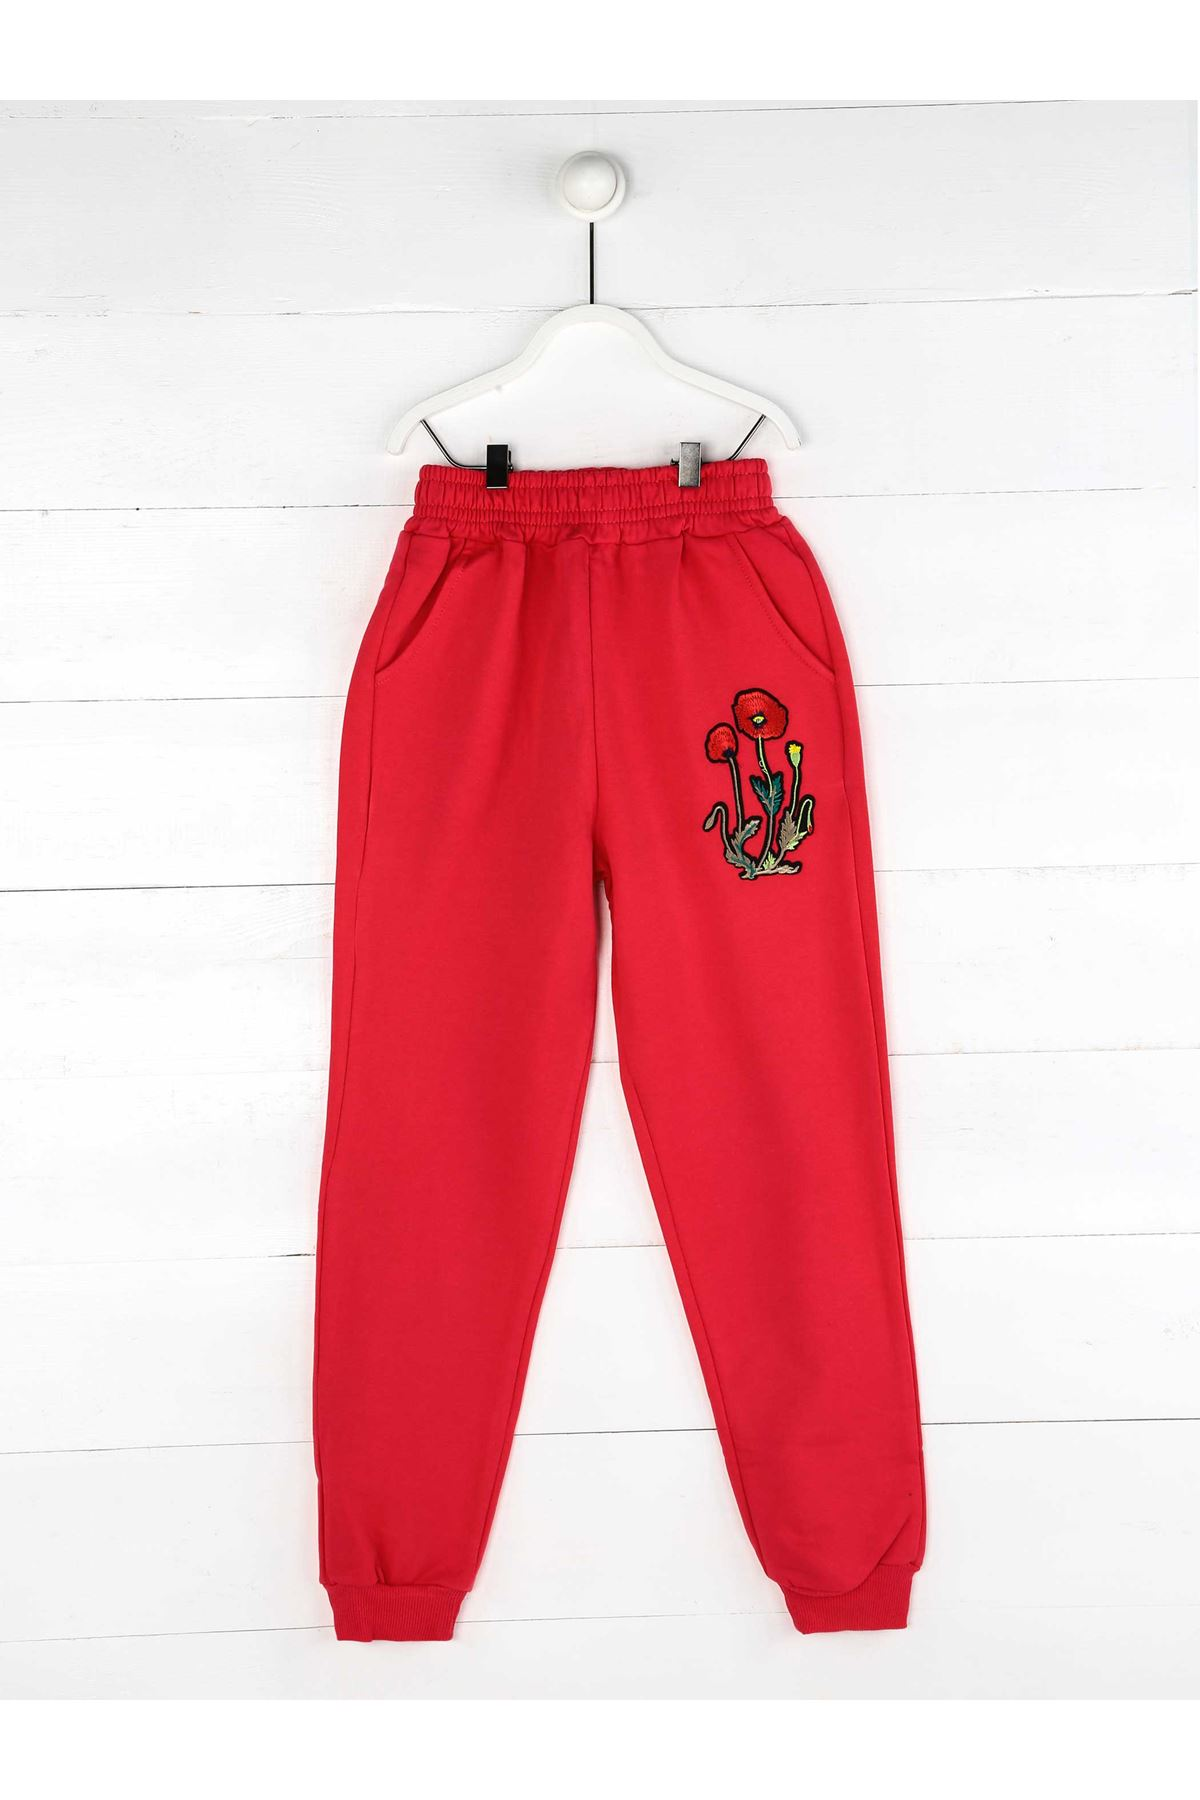 Pomegranate Flower Seasonal Girl Boy Sweatpants